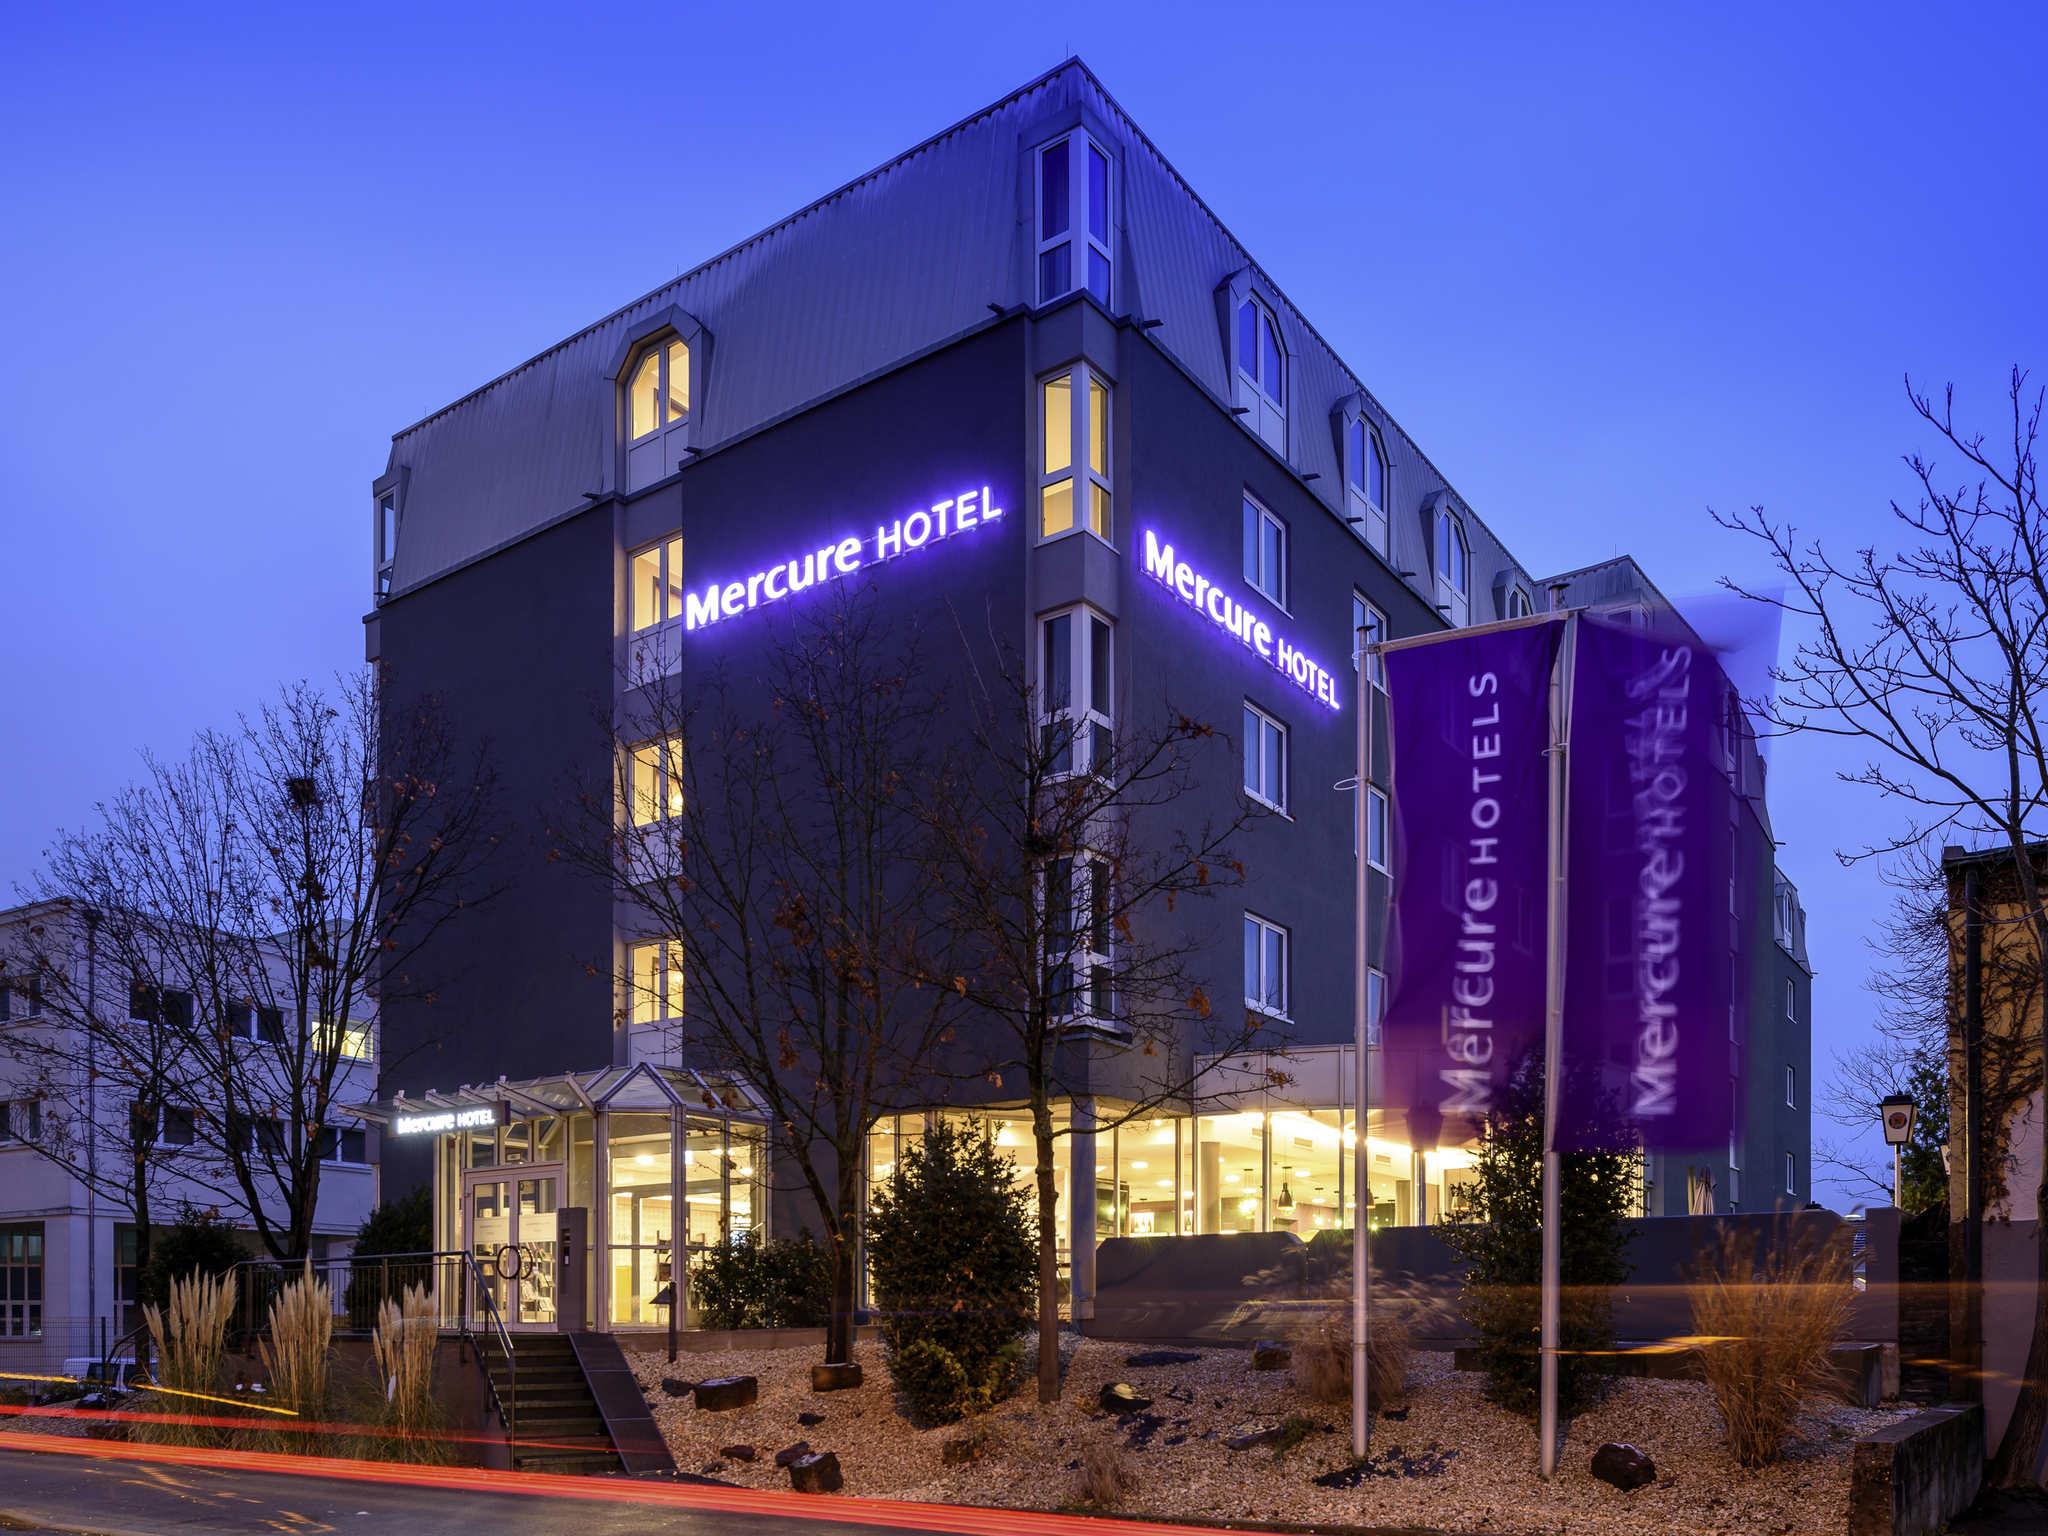 Hotel – Mercure Hotel Stuttgart Zuffenhausen (apertura: agosto 2017)